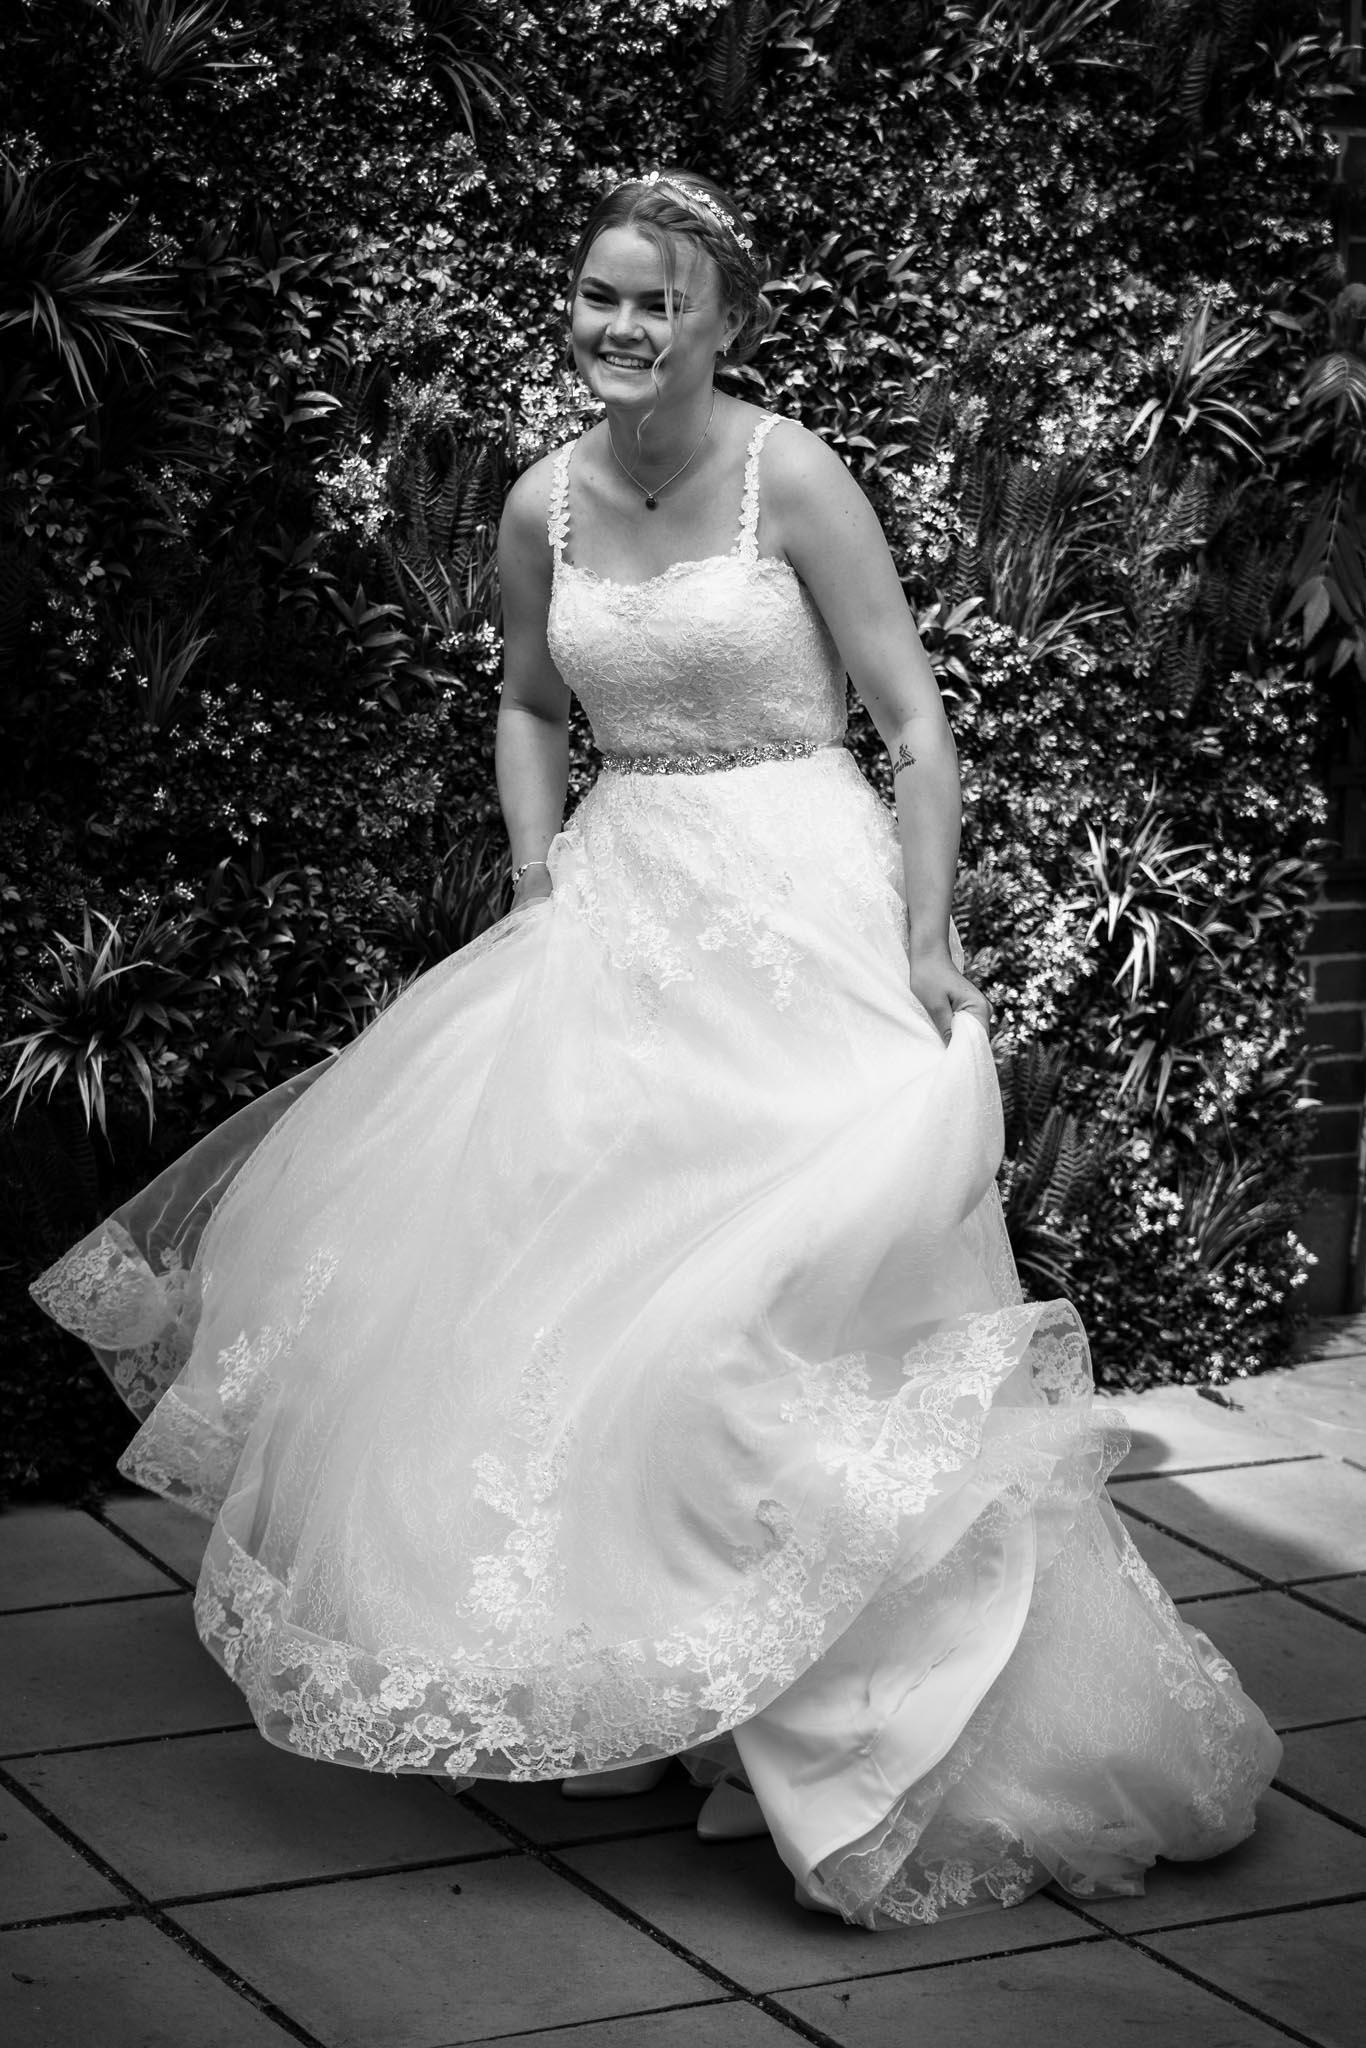 065-Preparations-Luke-Yasmin-The-Rayleigh-Club-Wedding-Photography.jpg